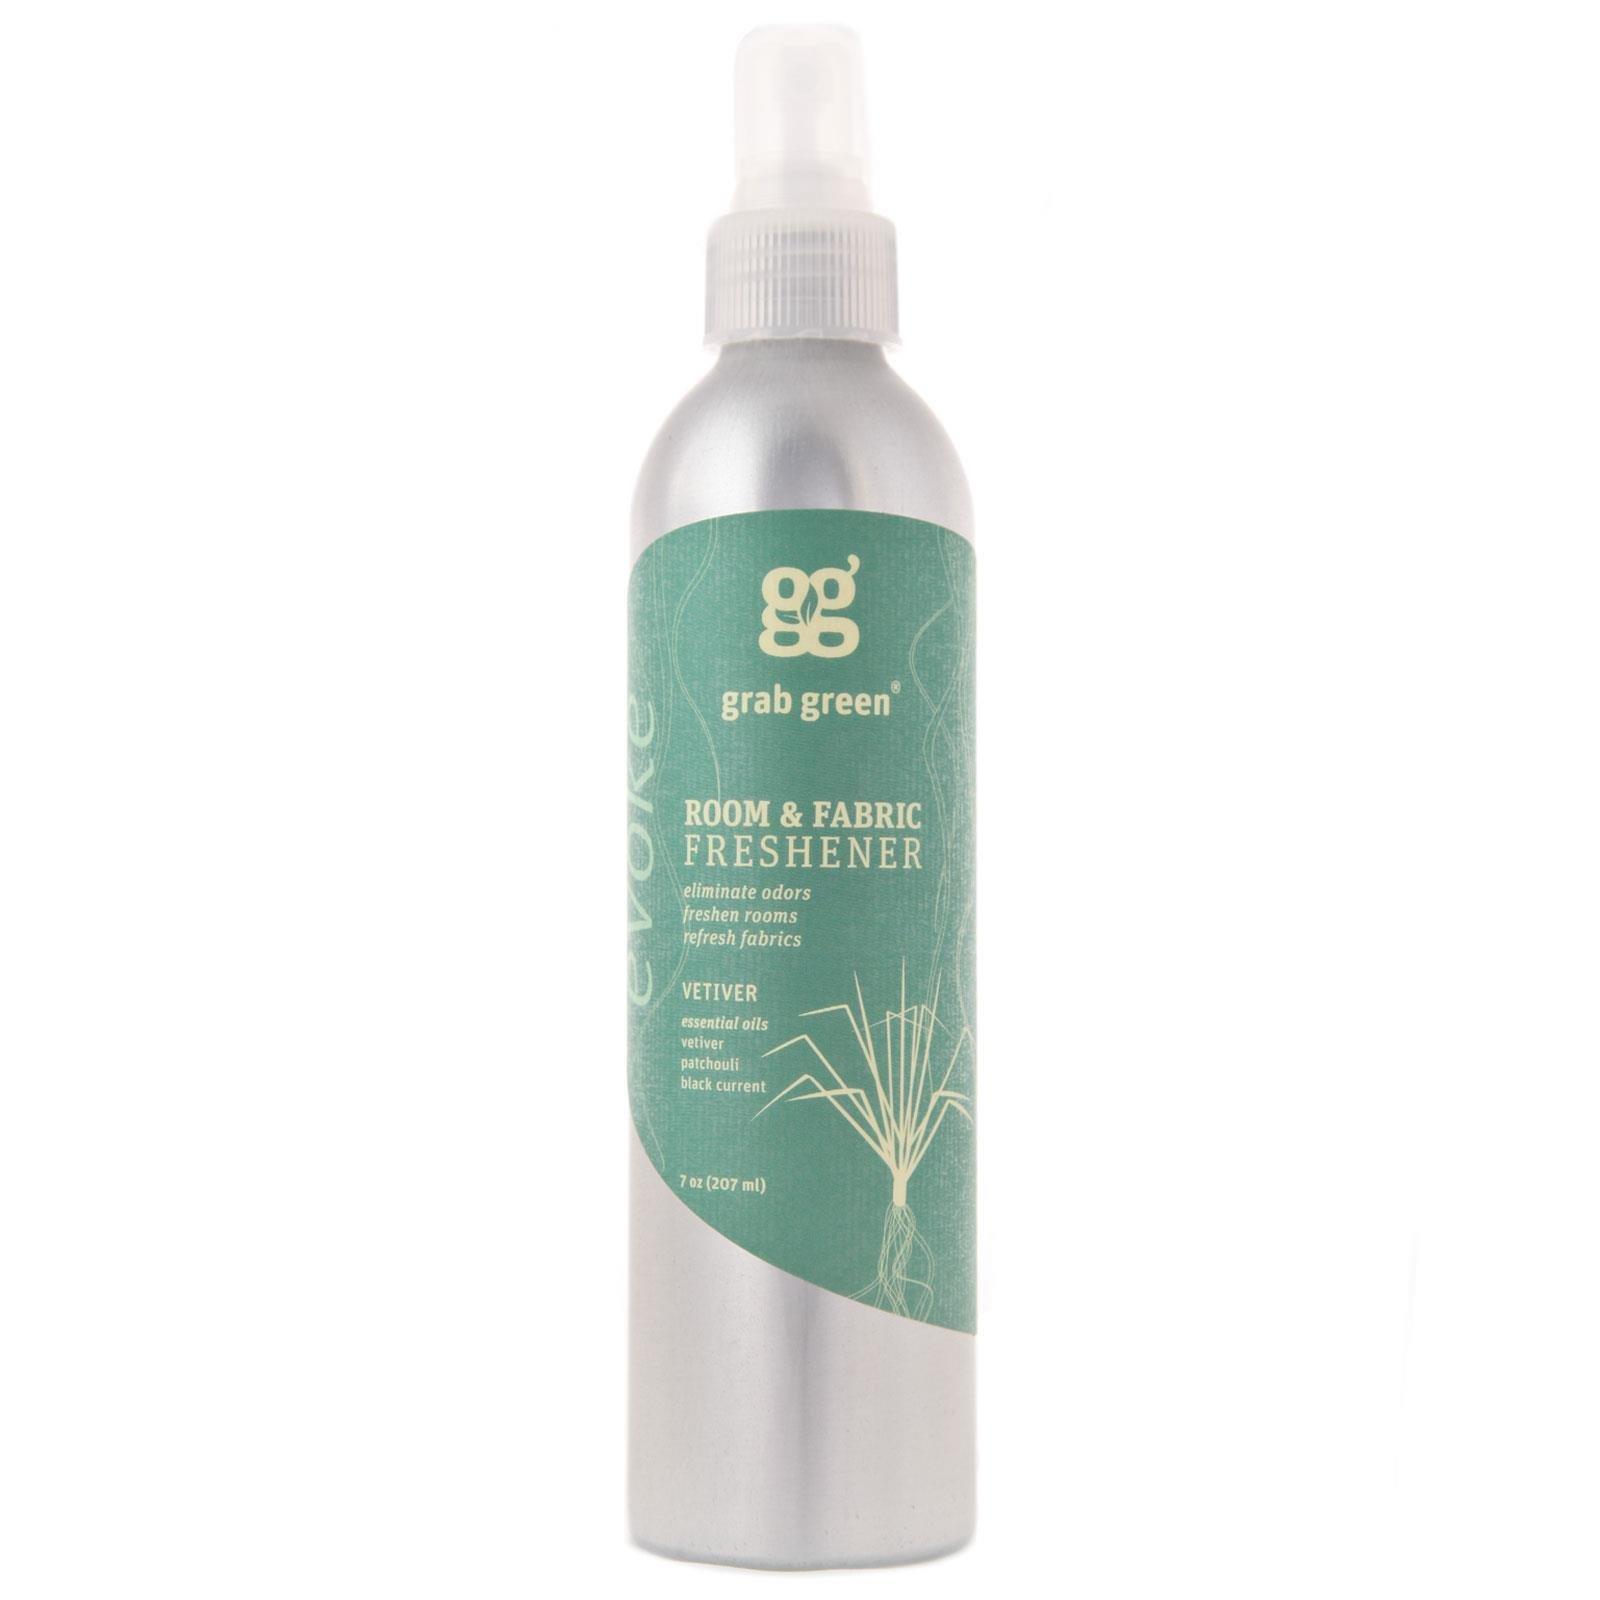 GrabGreen Room & Fabric Freshener Vetiver -- 7 oz